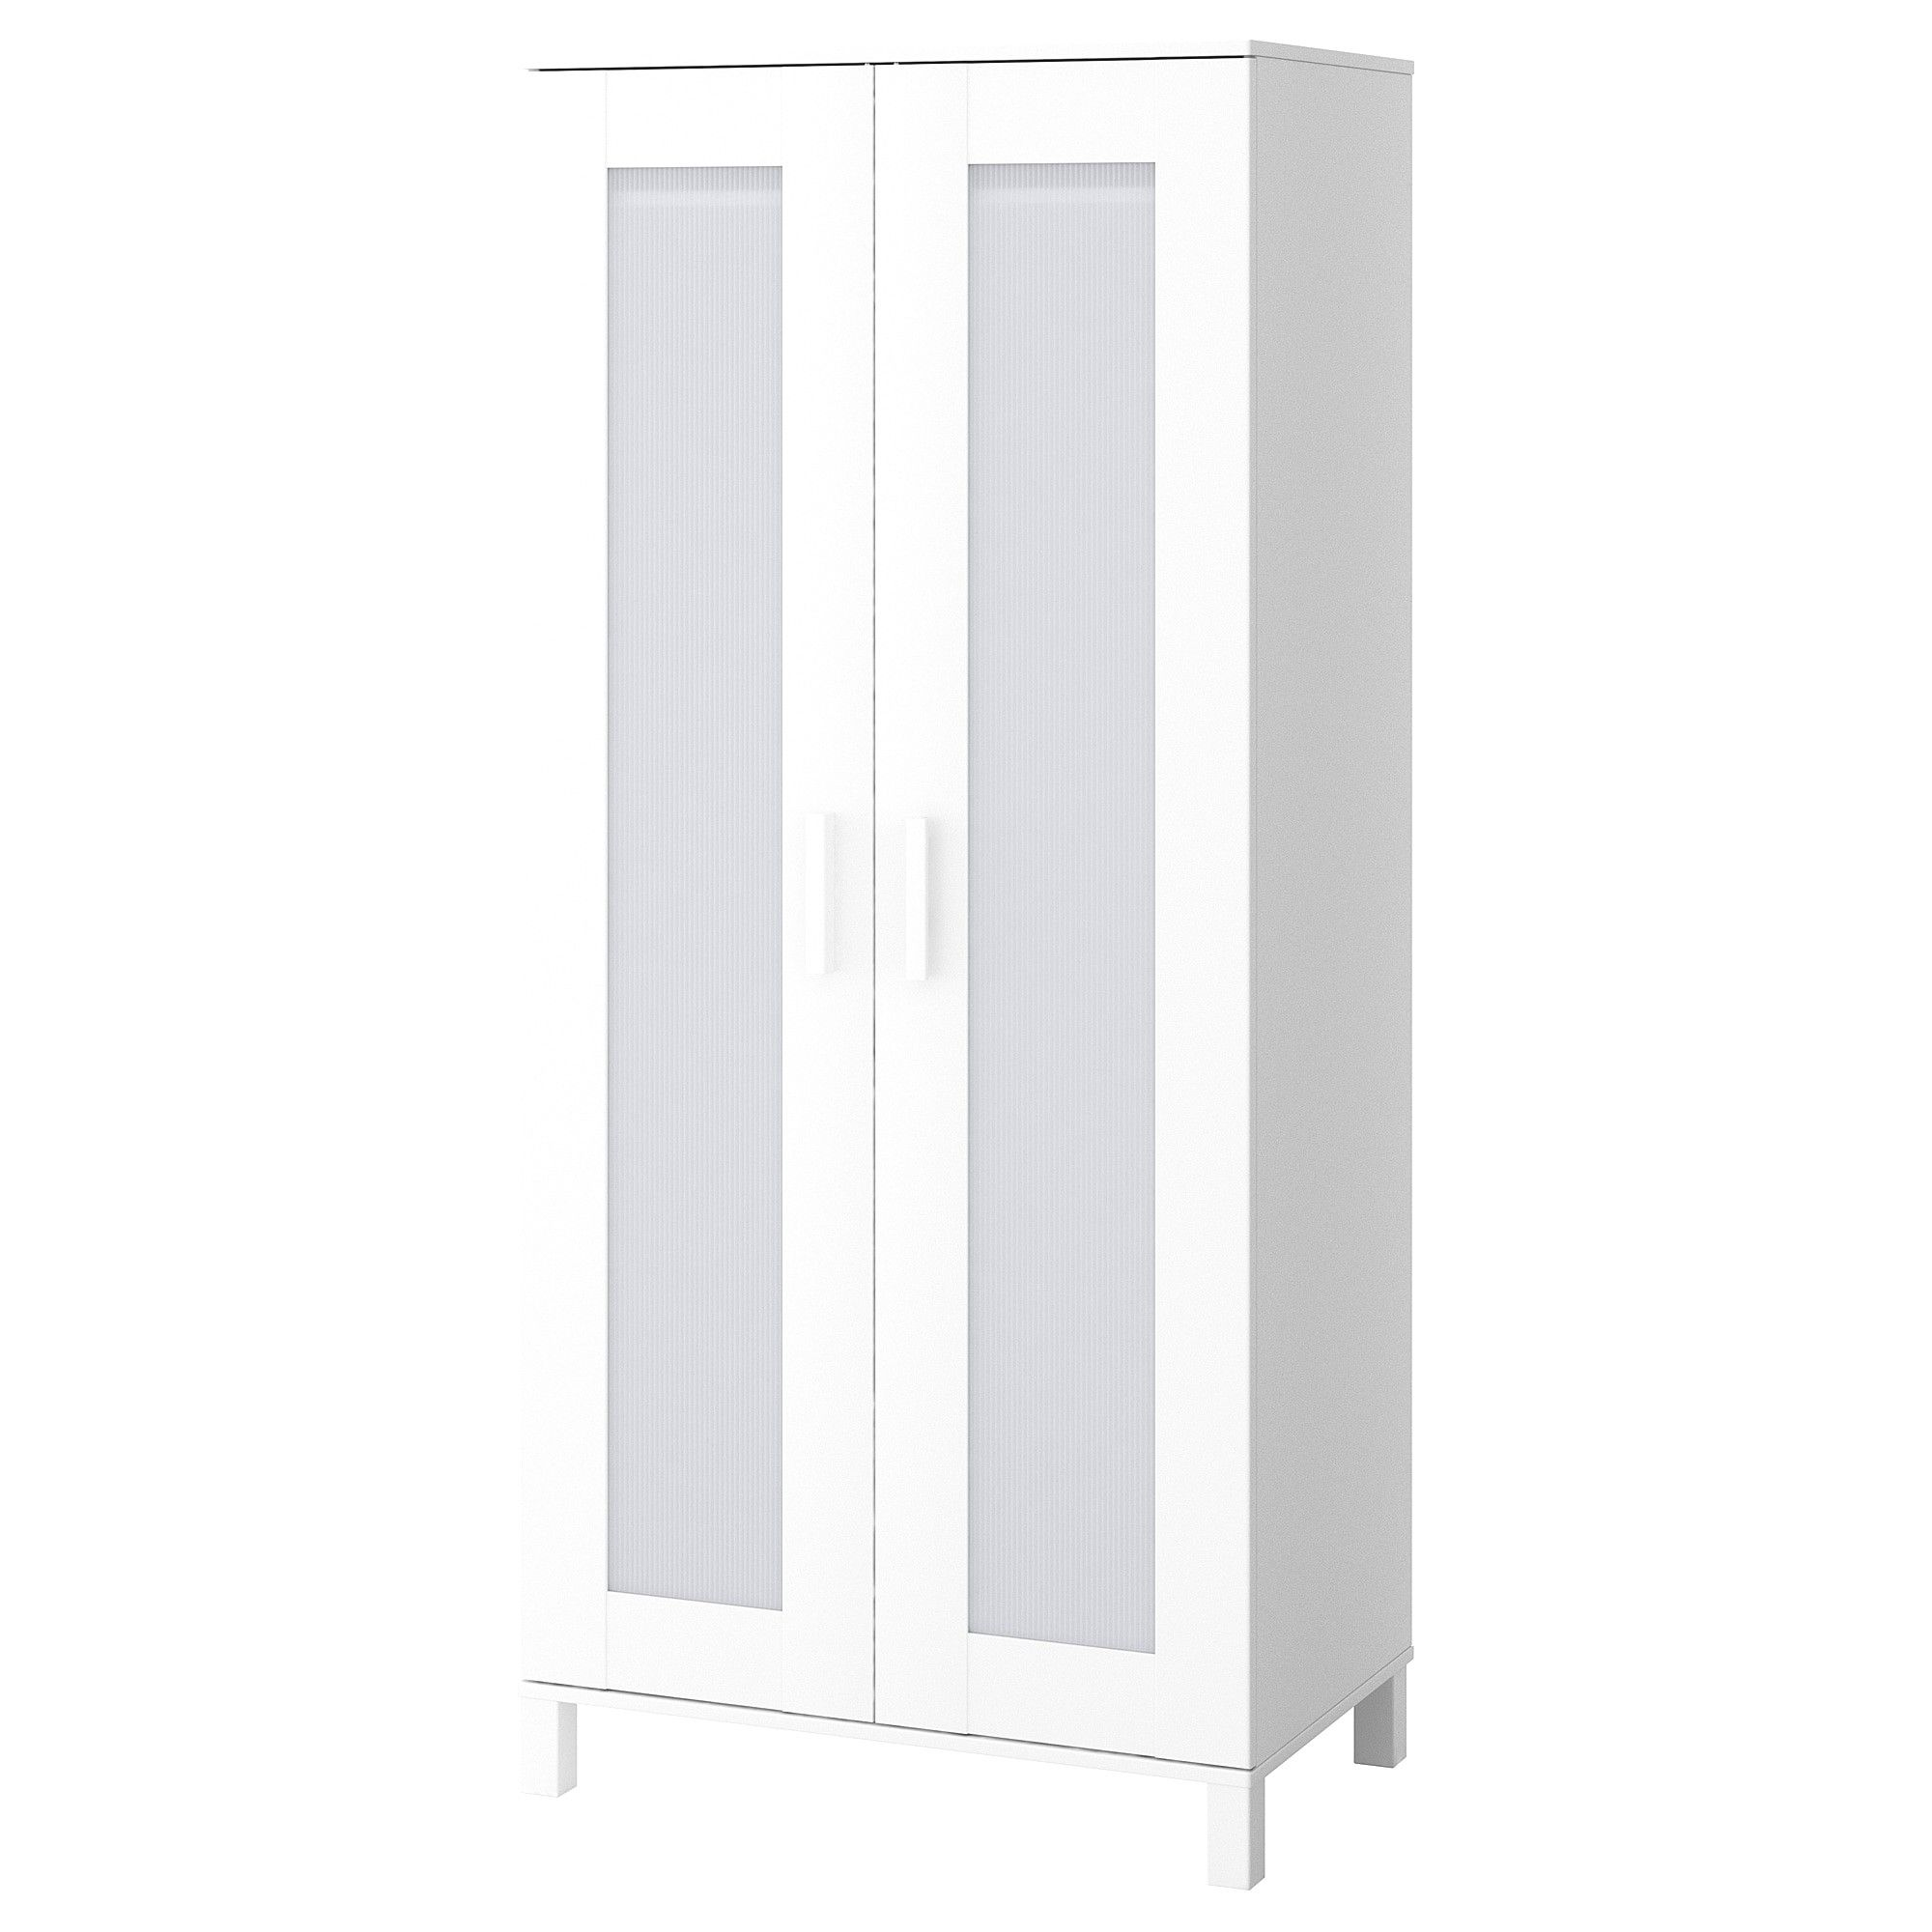 Armoire Porte Coulissante Kvikne Yahoo Image Search Results Meubel Ideeen Ikea Kledingkast